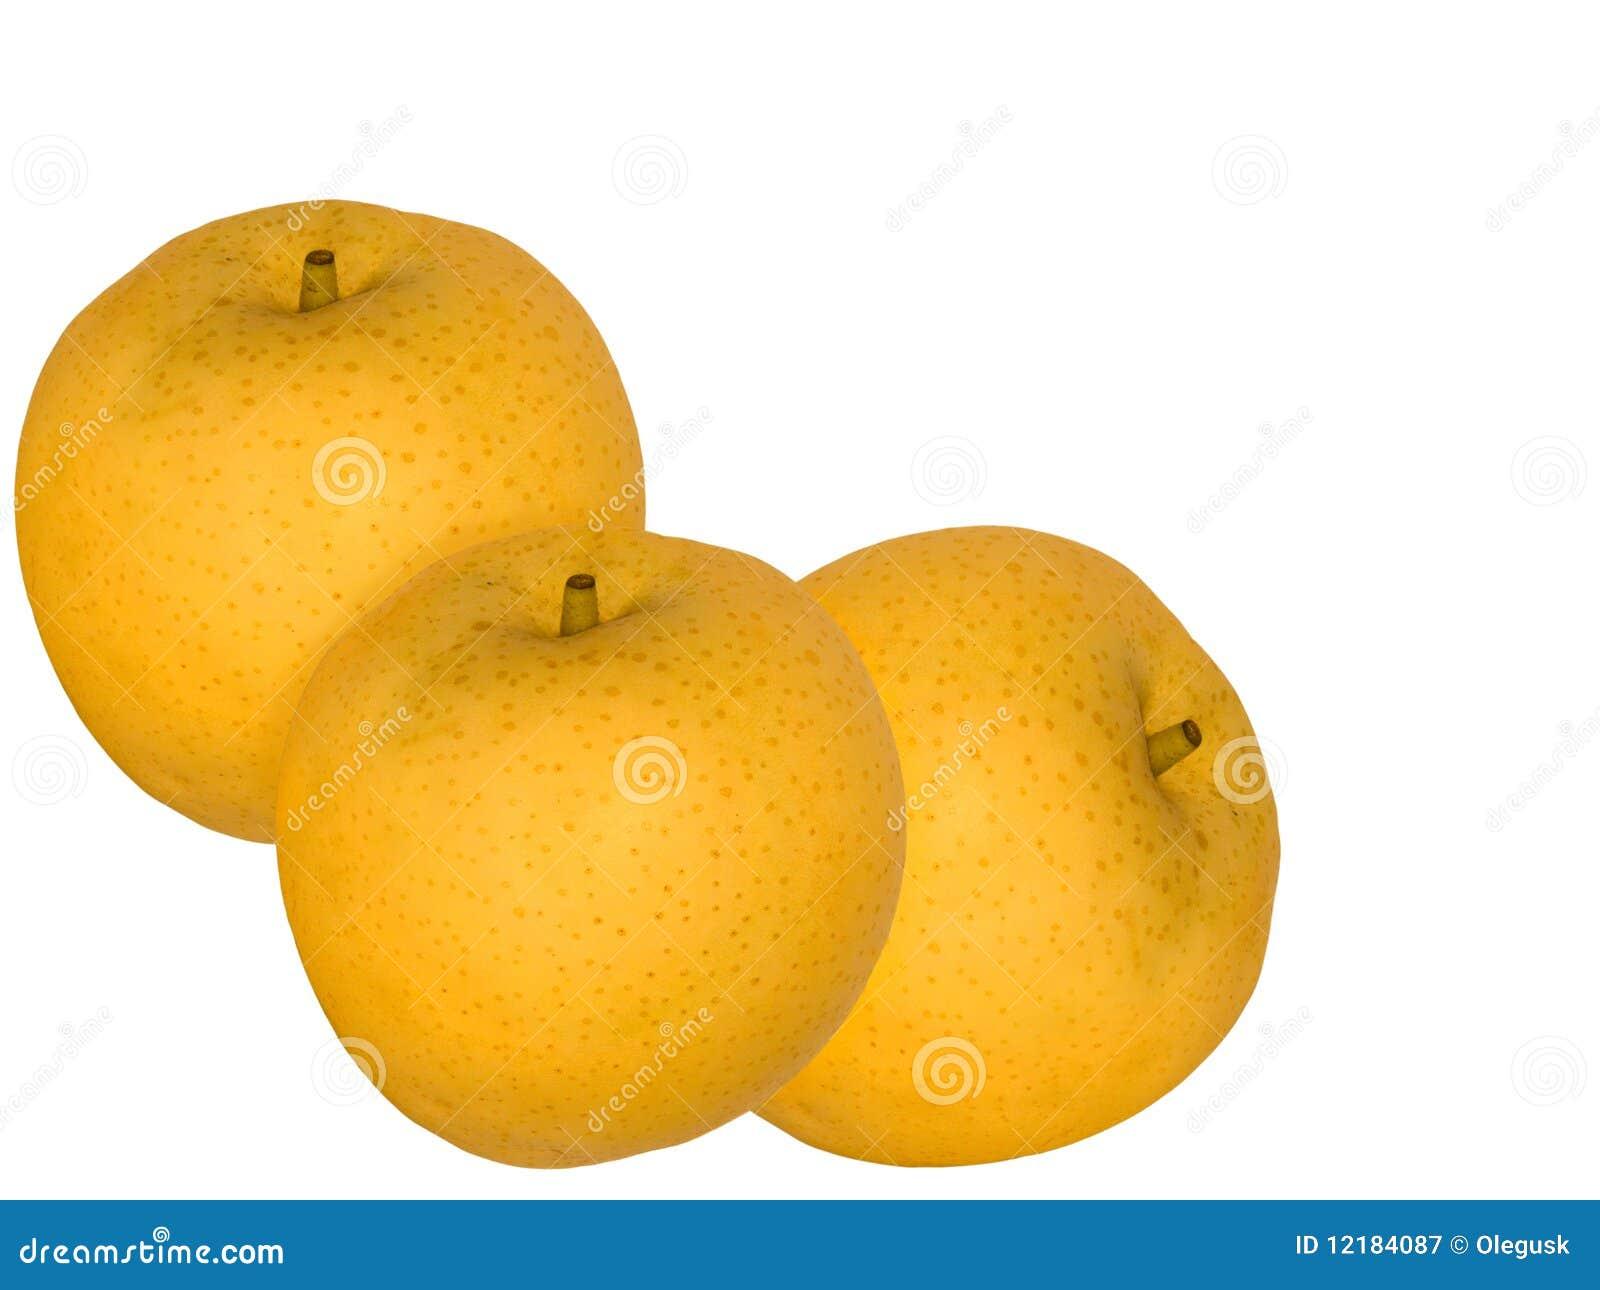 Fruit Hybrid Apple Pear Stock Image Image Of Meal Apple 12184087